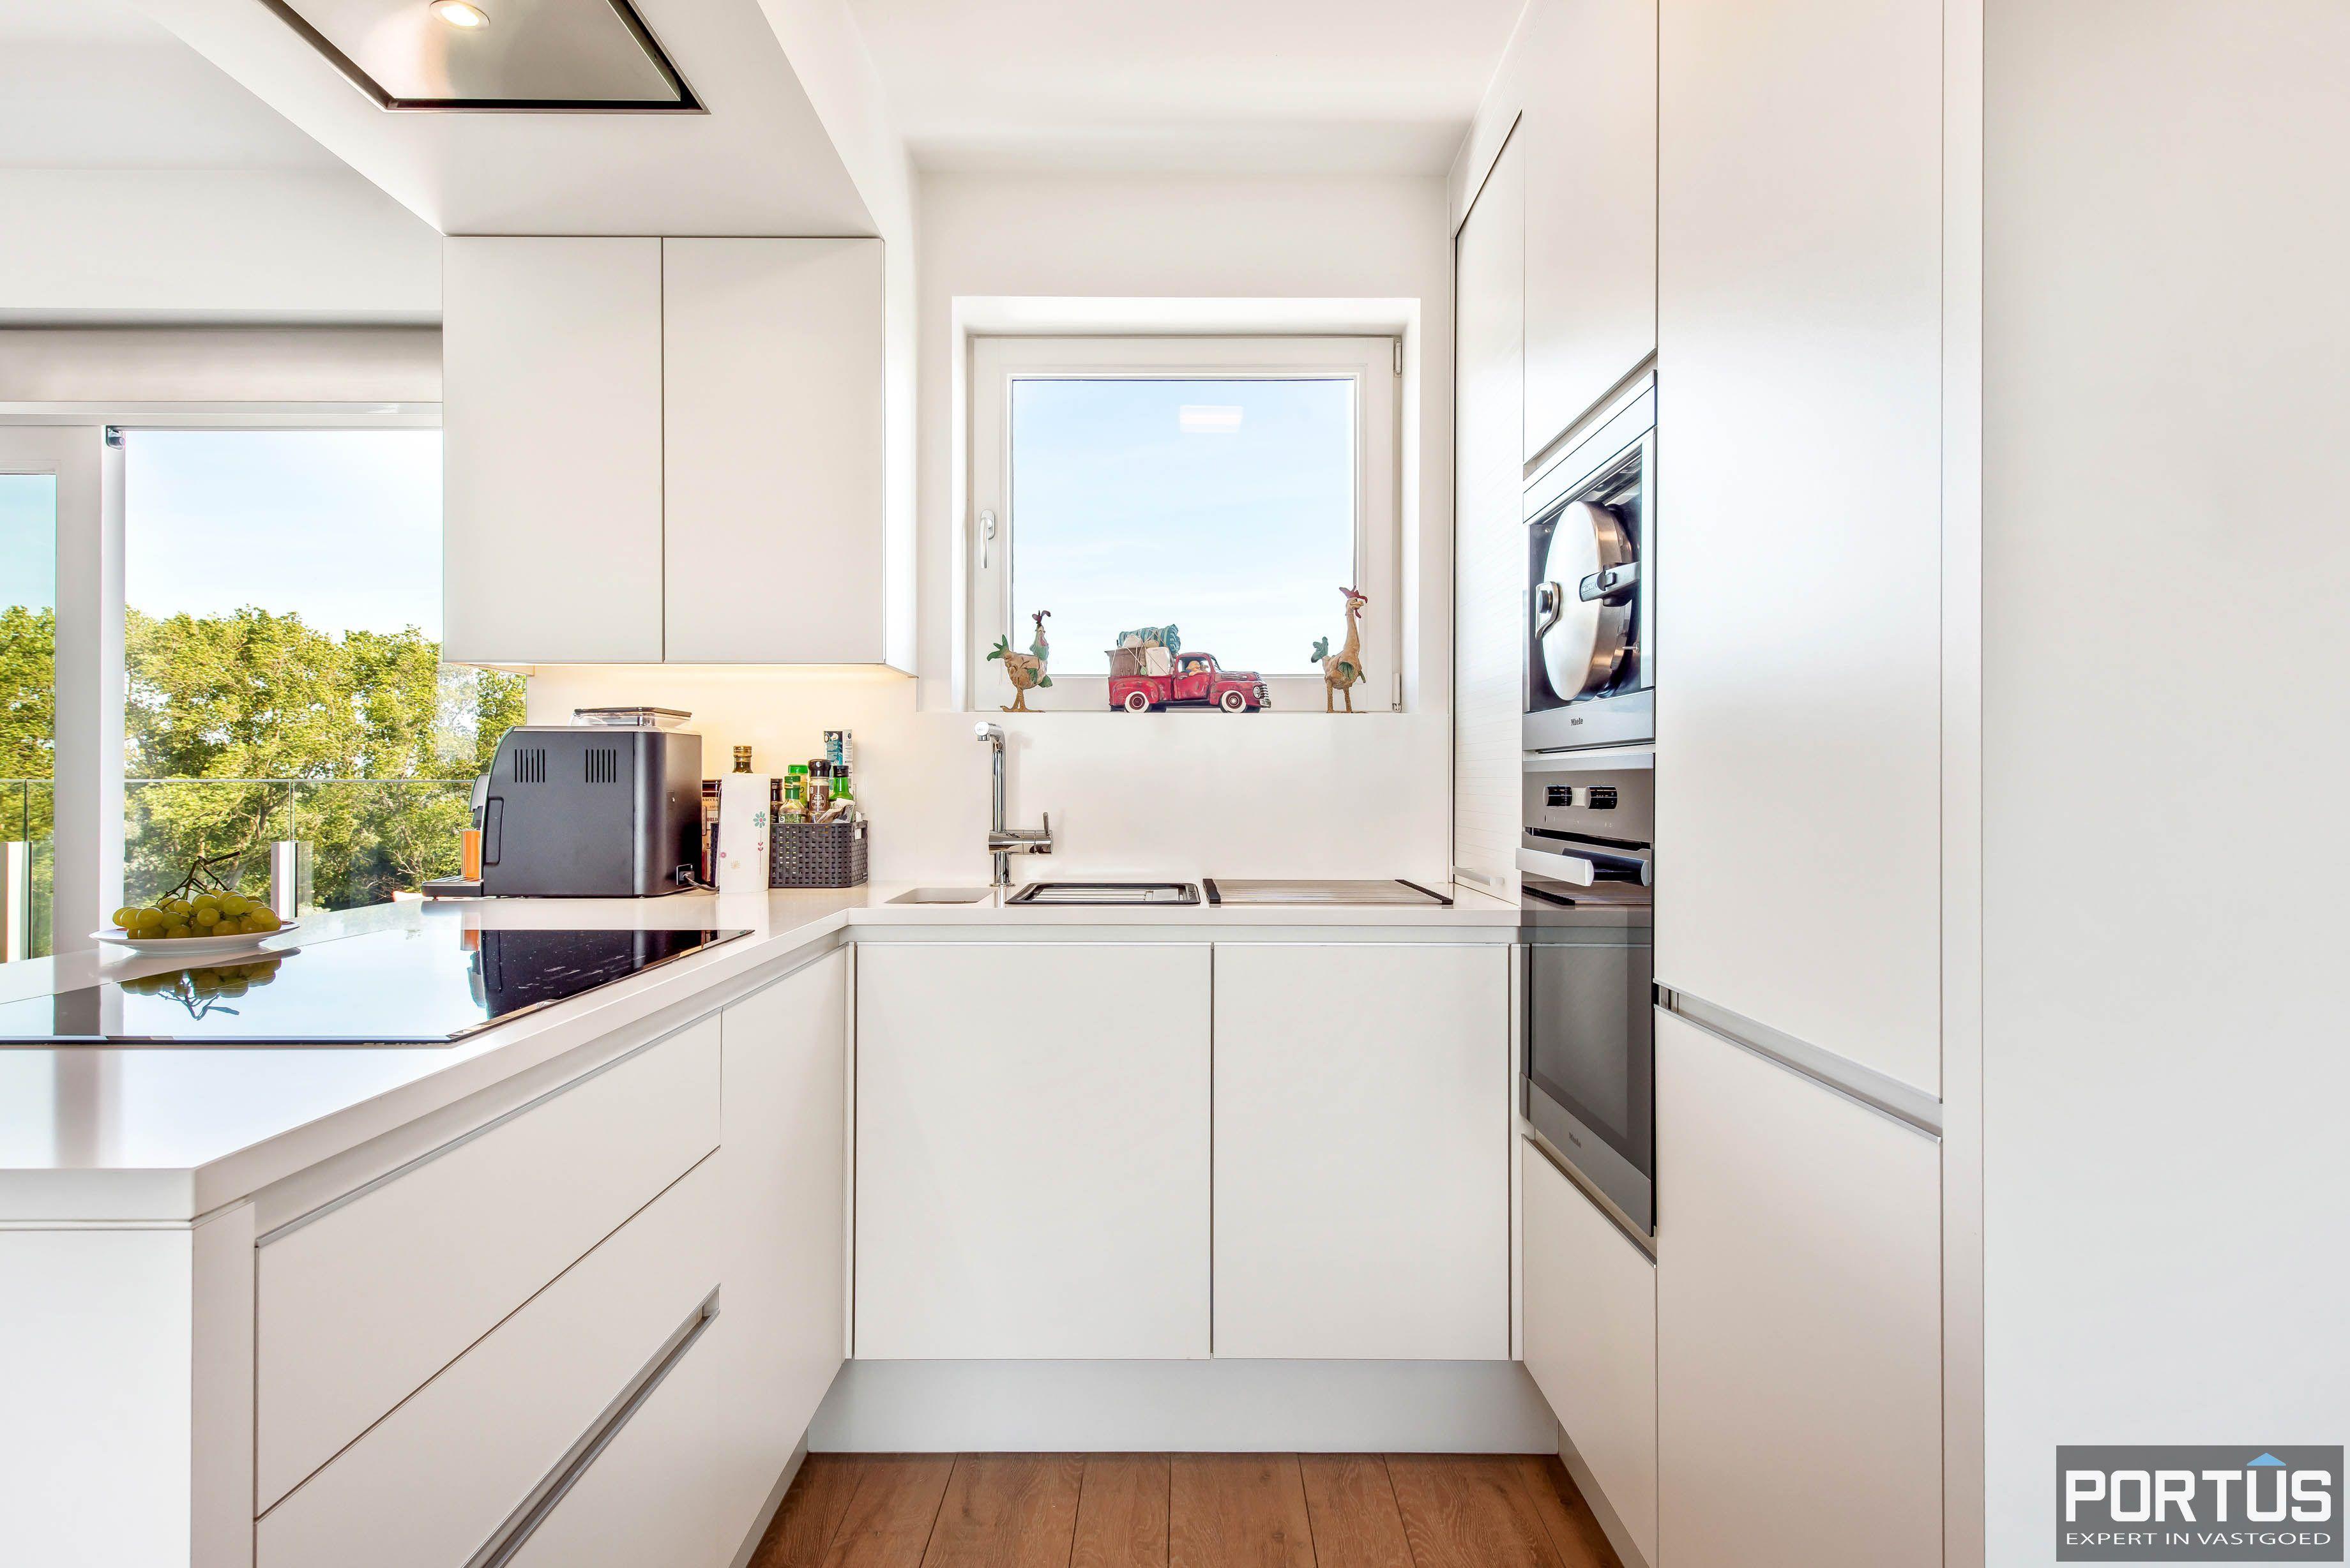 Exclusieve penthouse met 3 slaapkamers te koop te Nieuwpoort - 10923